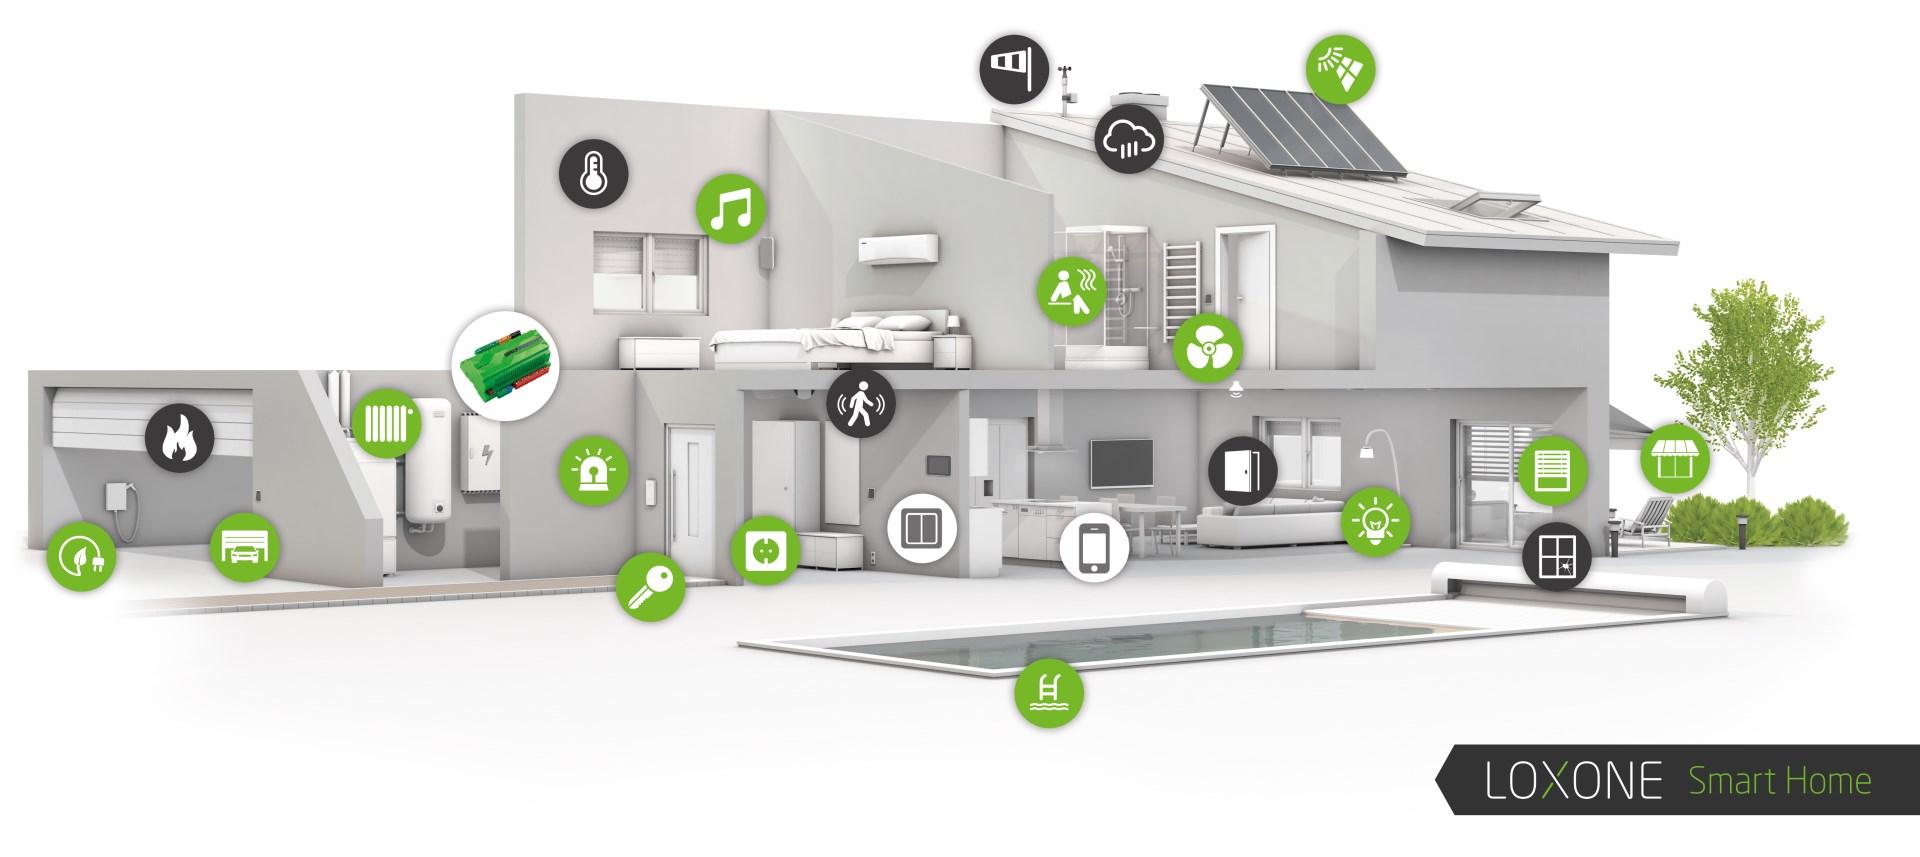 Loxone smart home schema